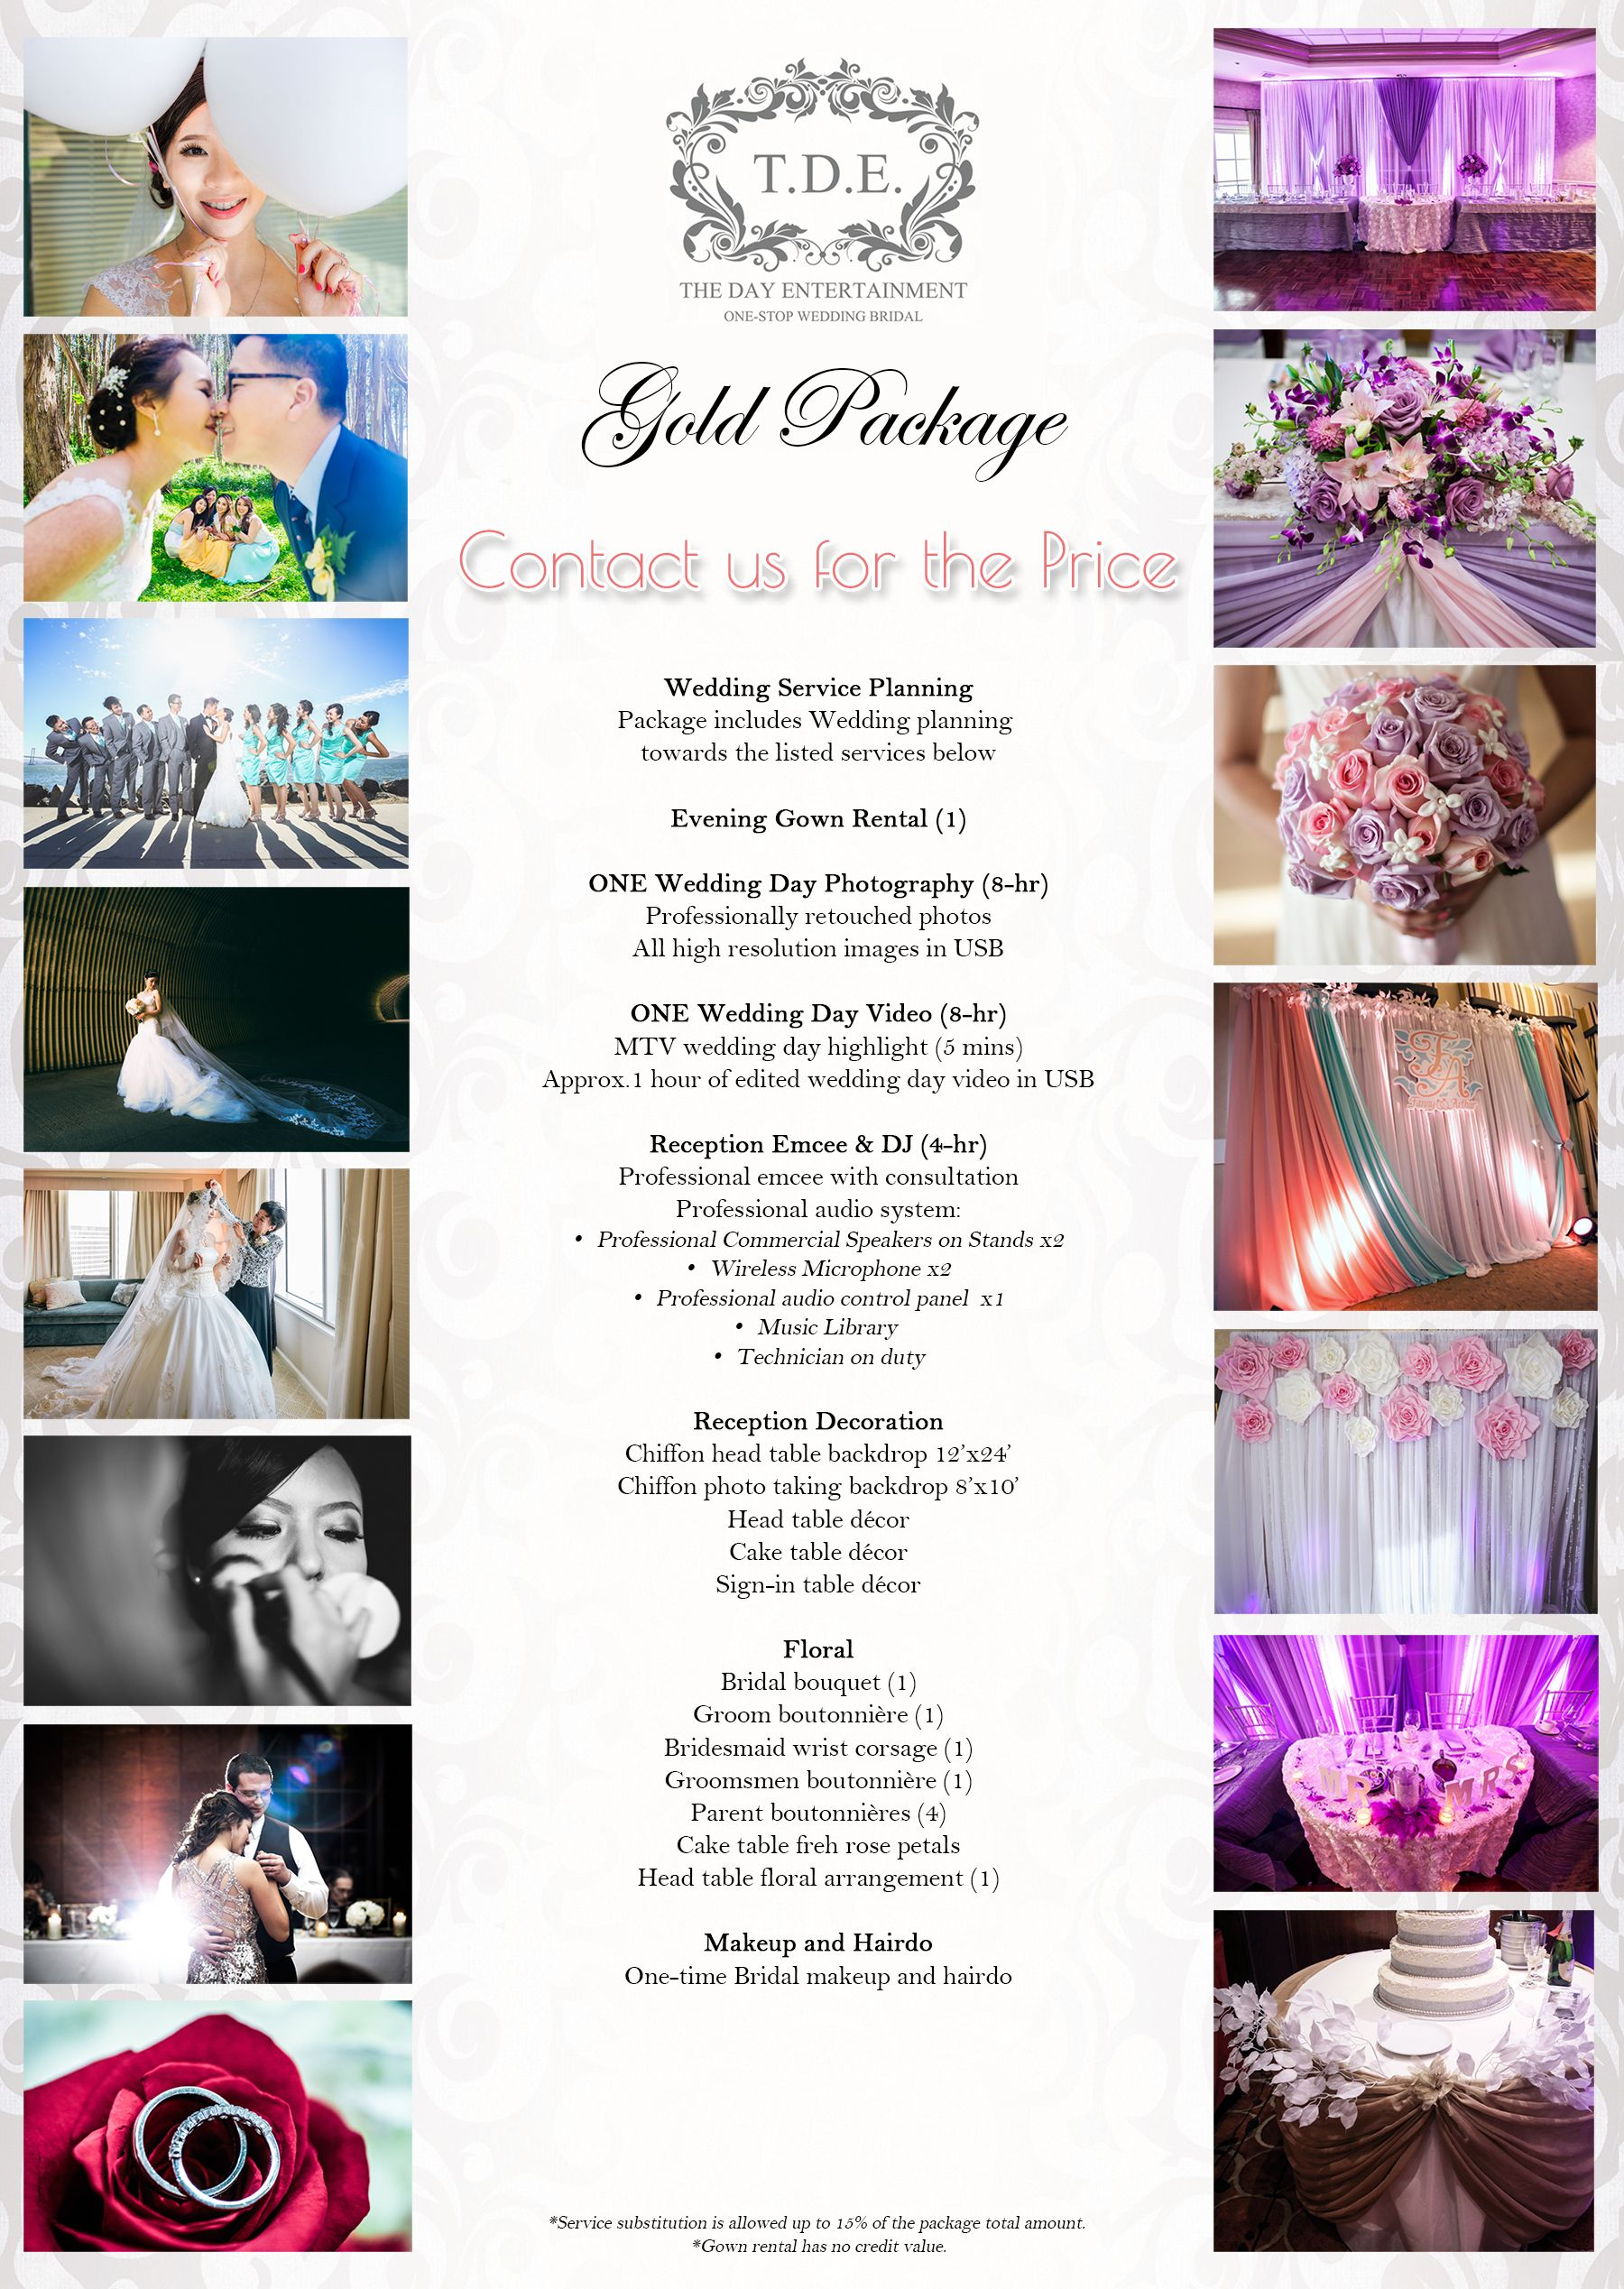 Wedding Decor Rental Prices Luxury Gold Package Tde Wedding Wedding Rentals Decor Wedding Decorations Wedding Party Planner